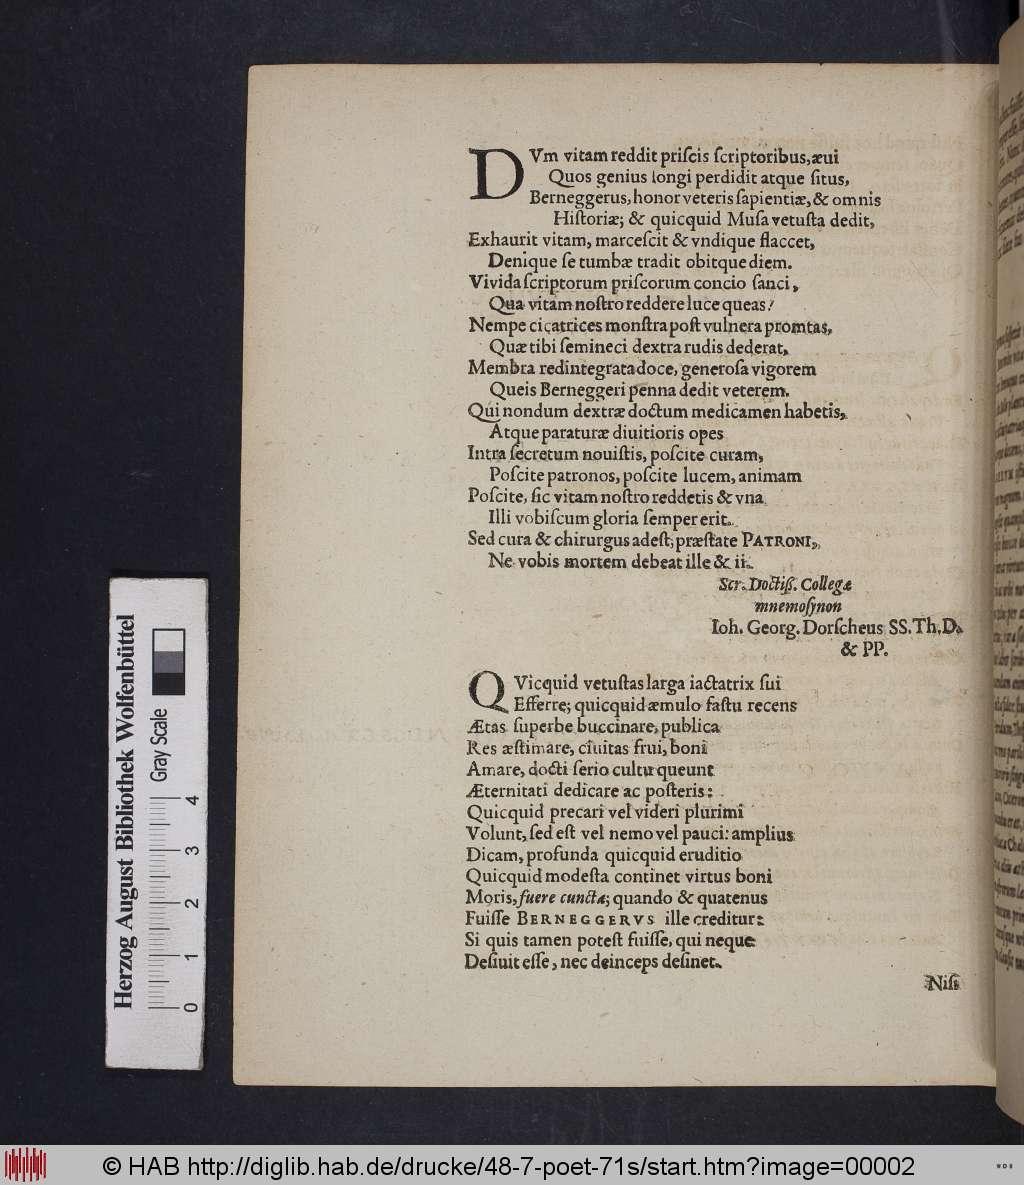 https://diglib.hab.de/drucke/48-7-poet-71s/00002.jpg